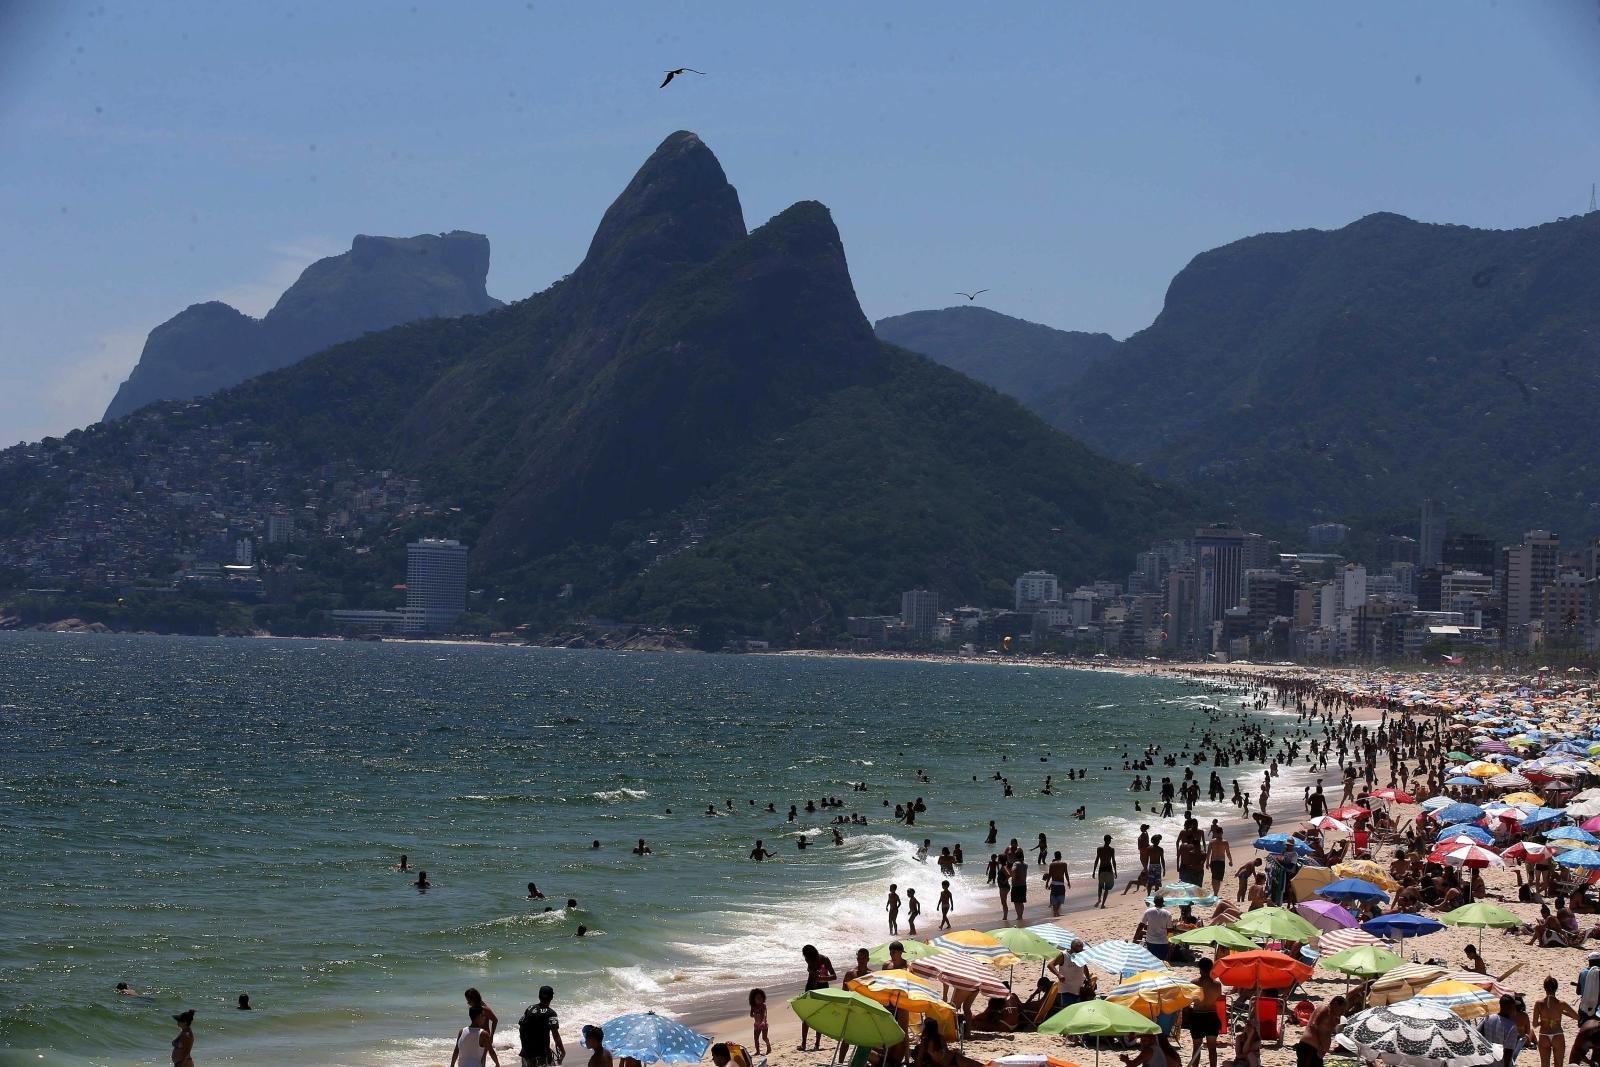 Rio de Janeiro. fot. EPA/Marcelo Sayao